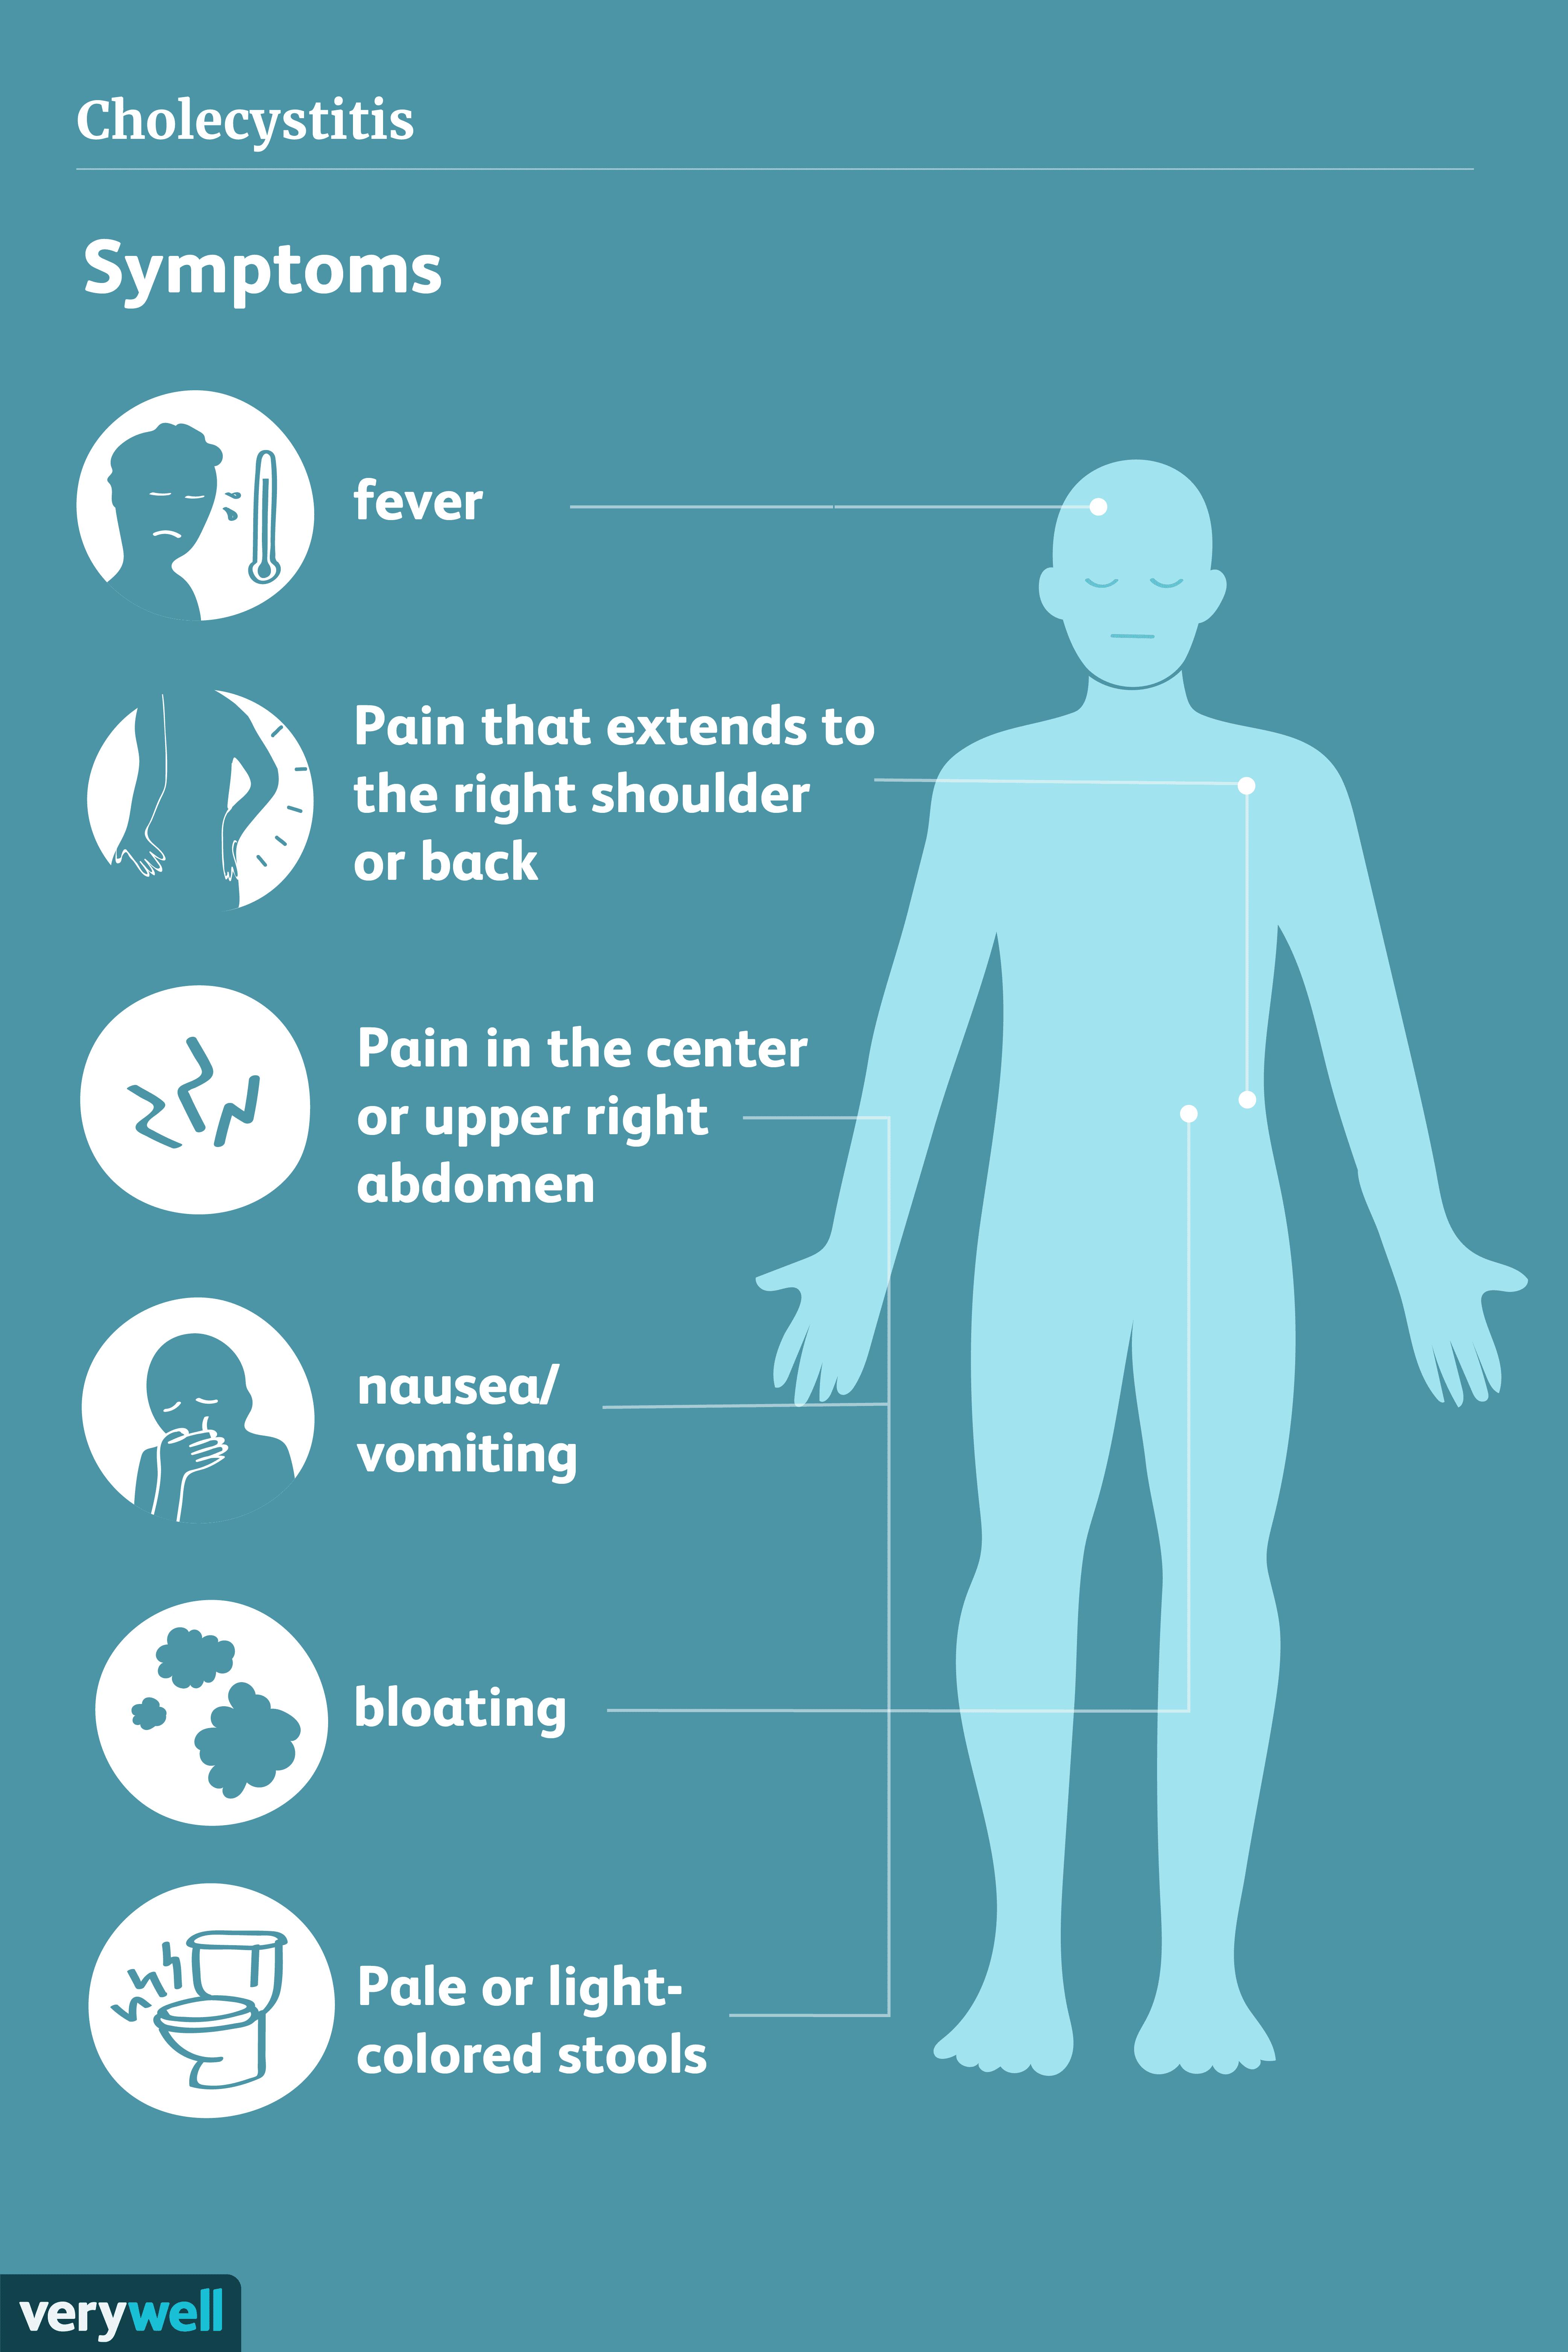 Symptoms of cholecystitis